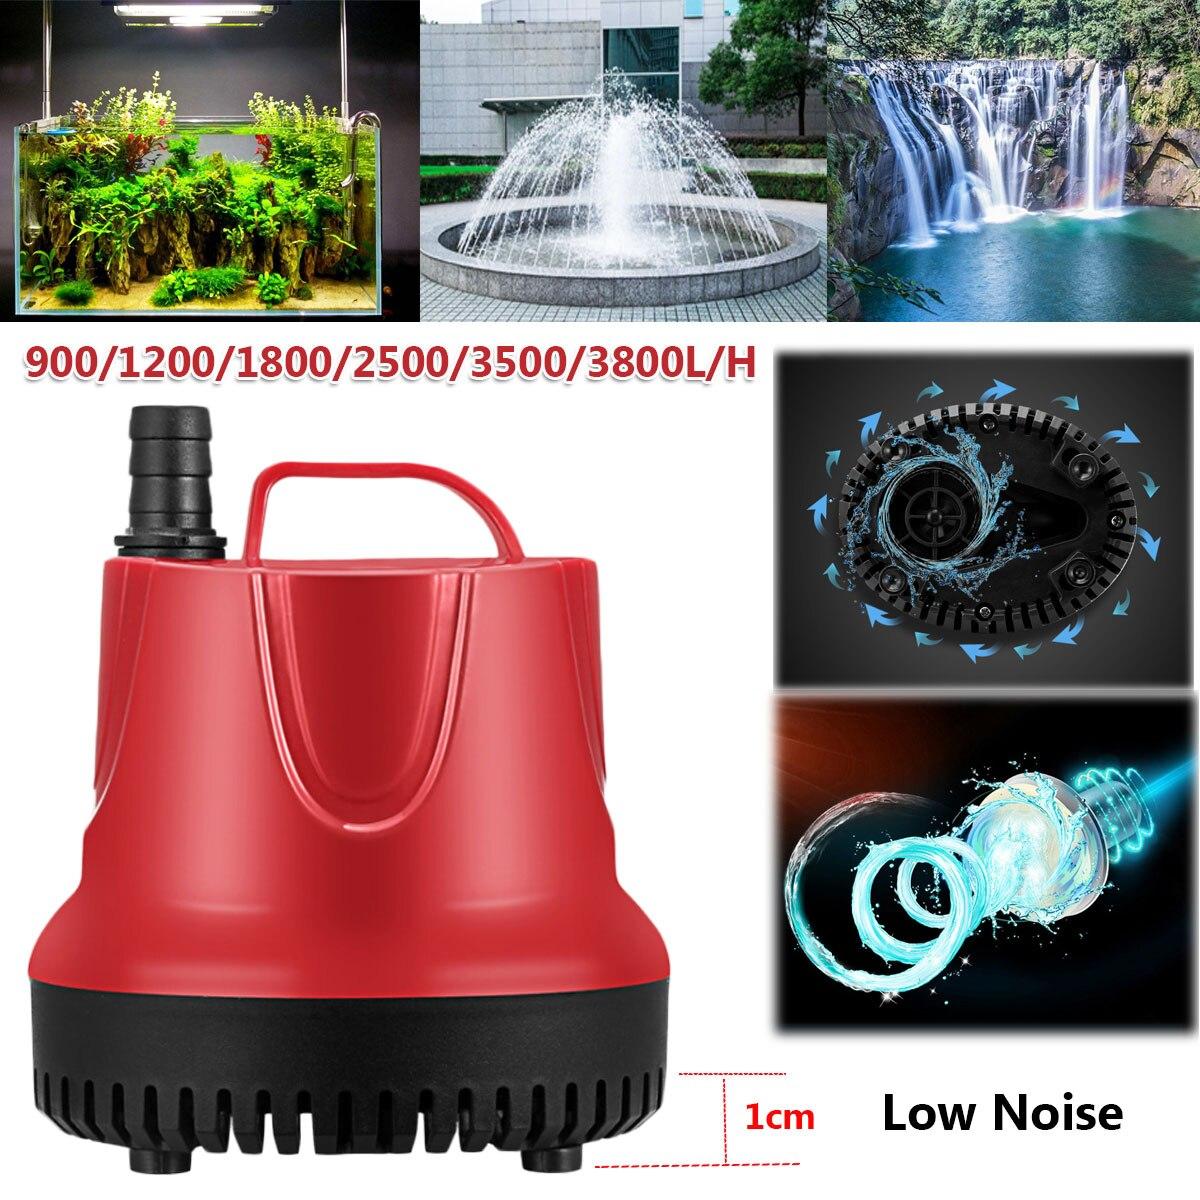 10/15/30/45/60/80W 50Hz Water Pump Fish Tank Submersible Ultra-Quiet Pump Fountain Aquarium Pond Spout Feature Pump with US Plug